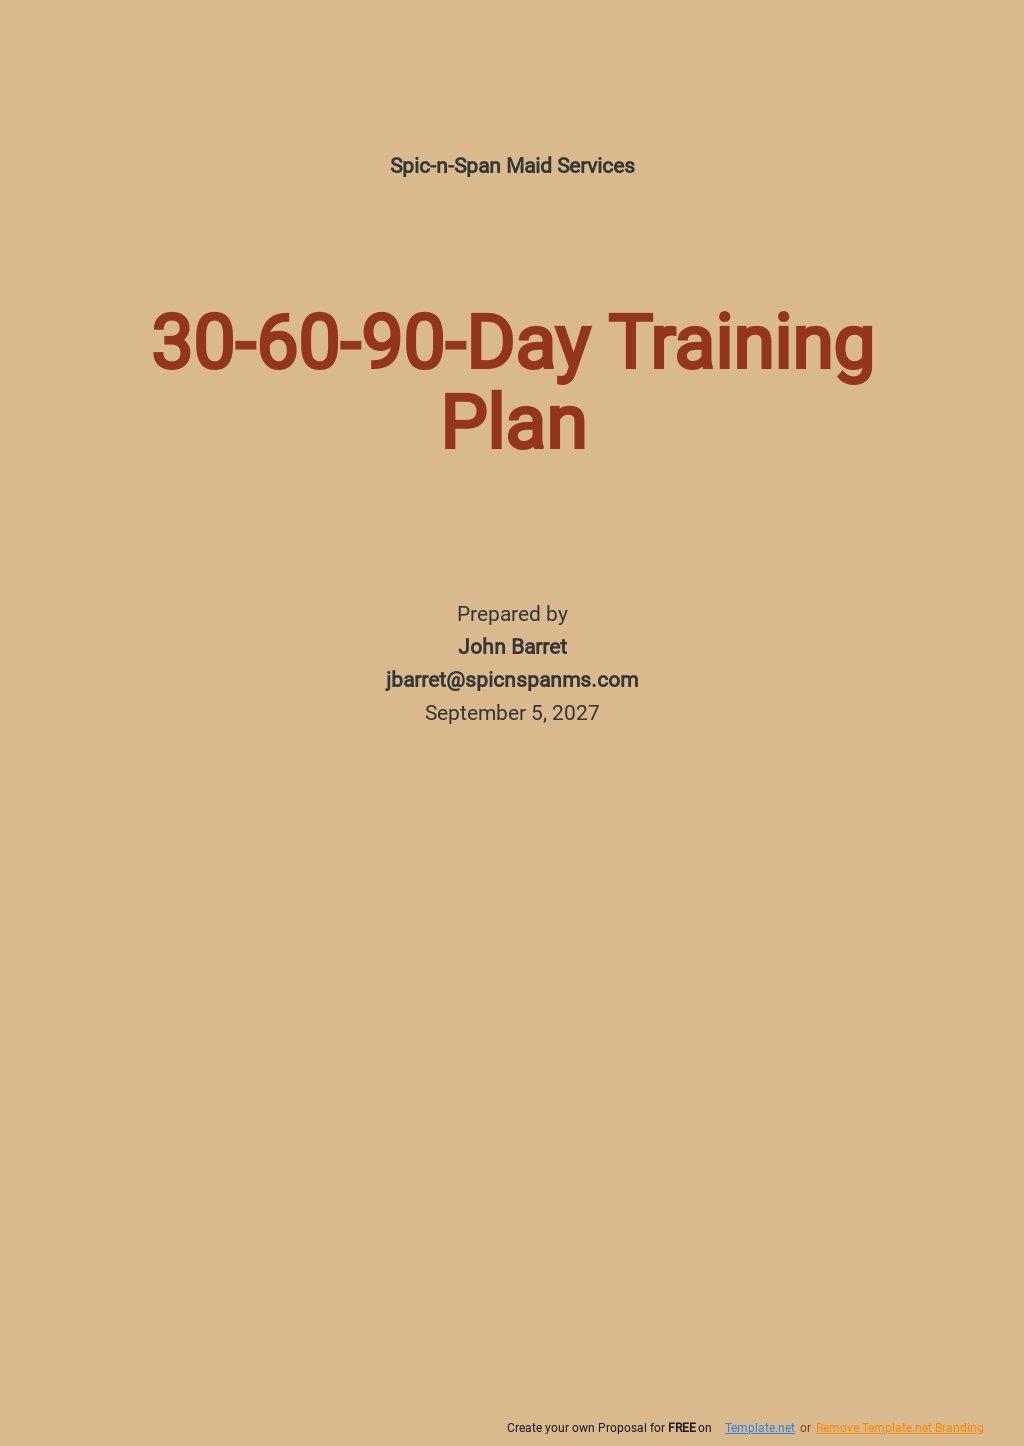 30 60 90 Day Training Plan Template.jpe